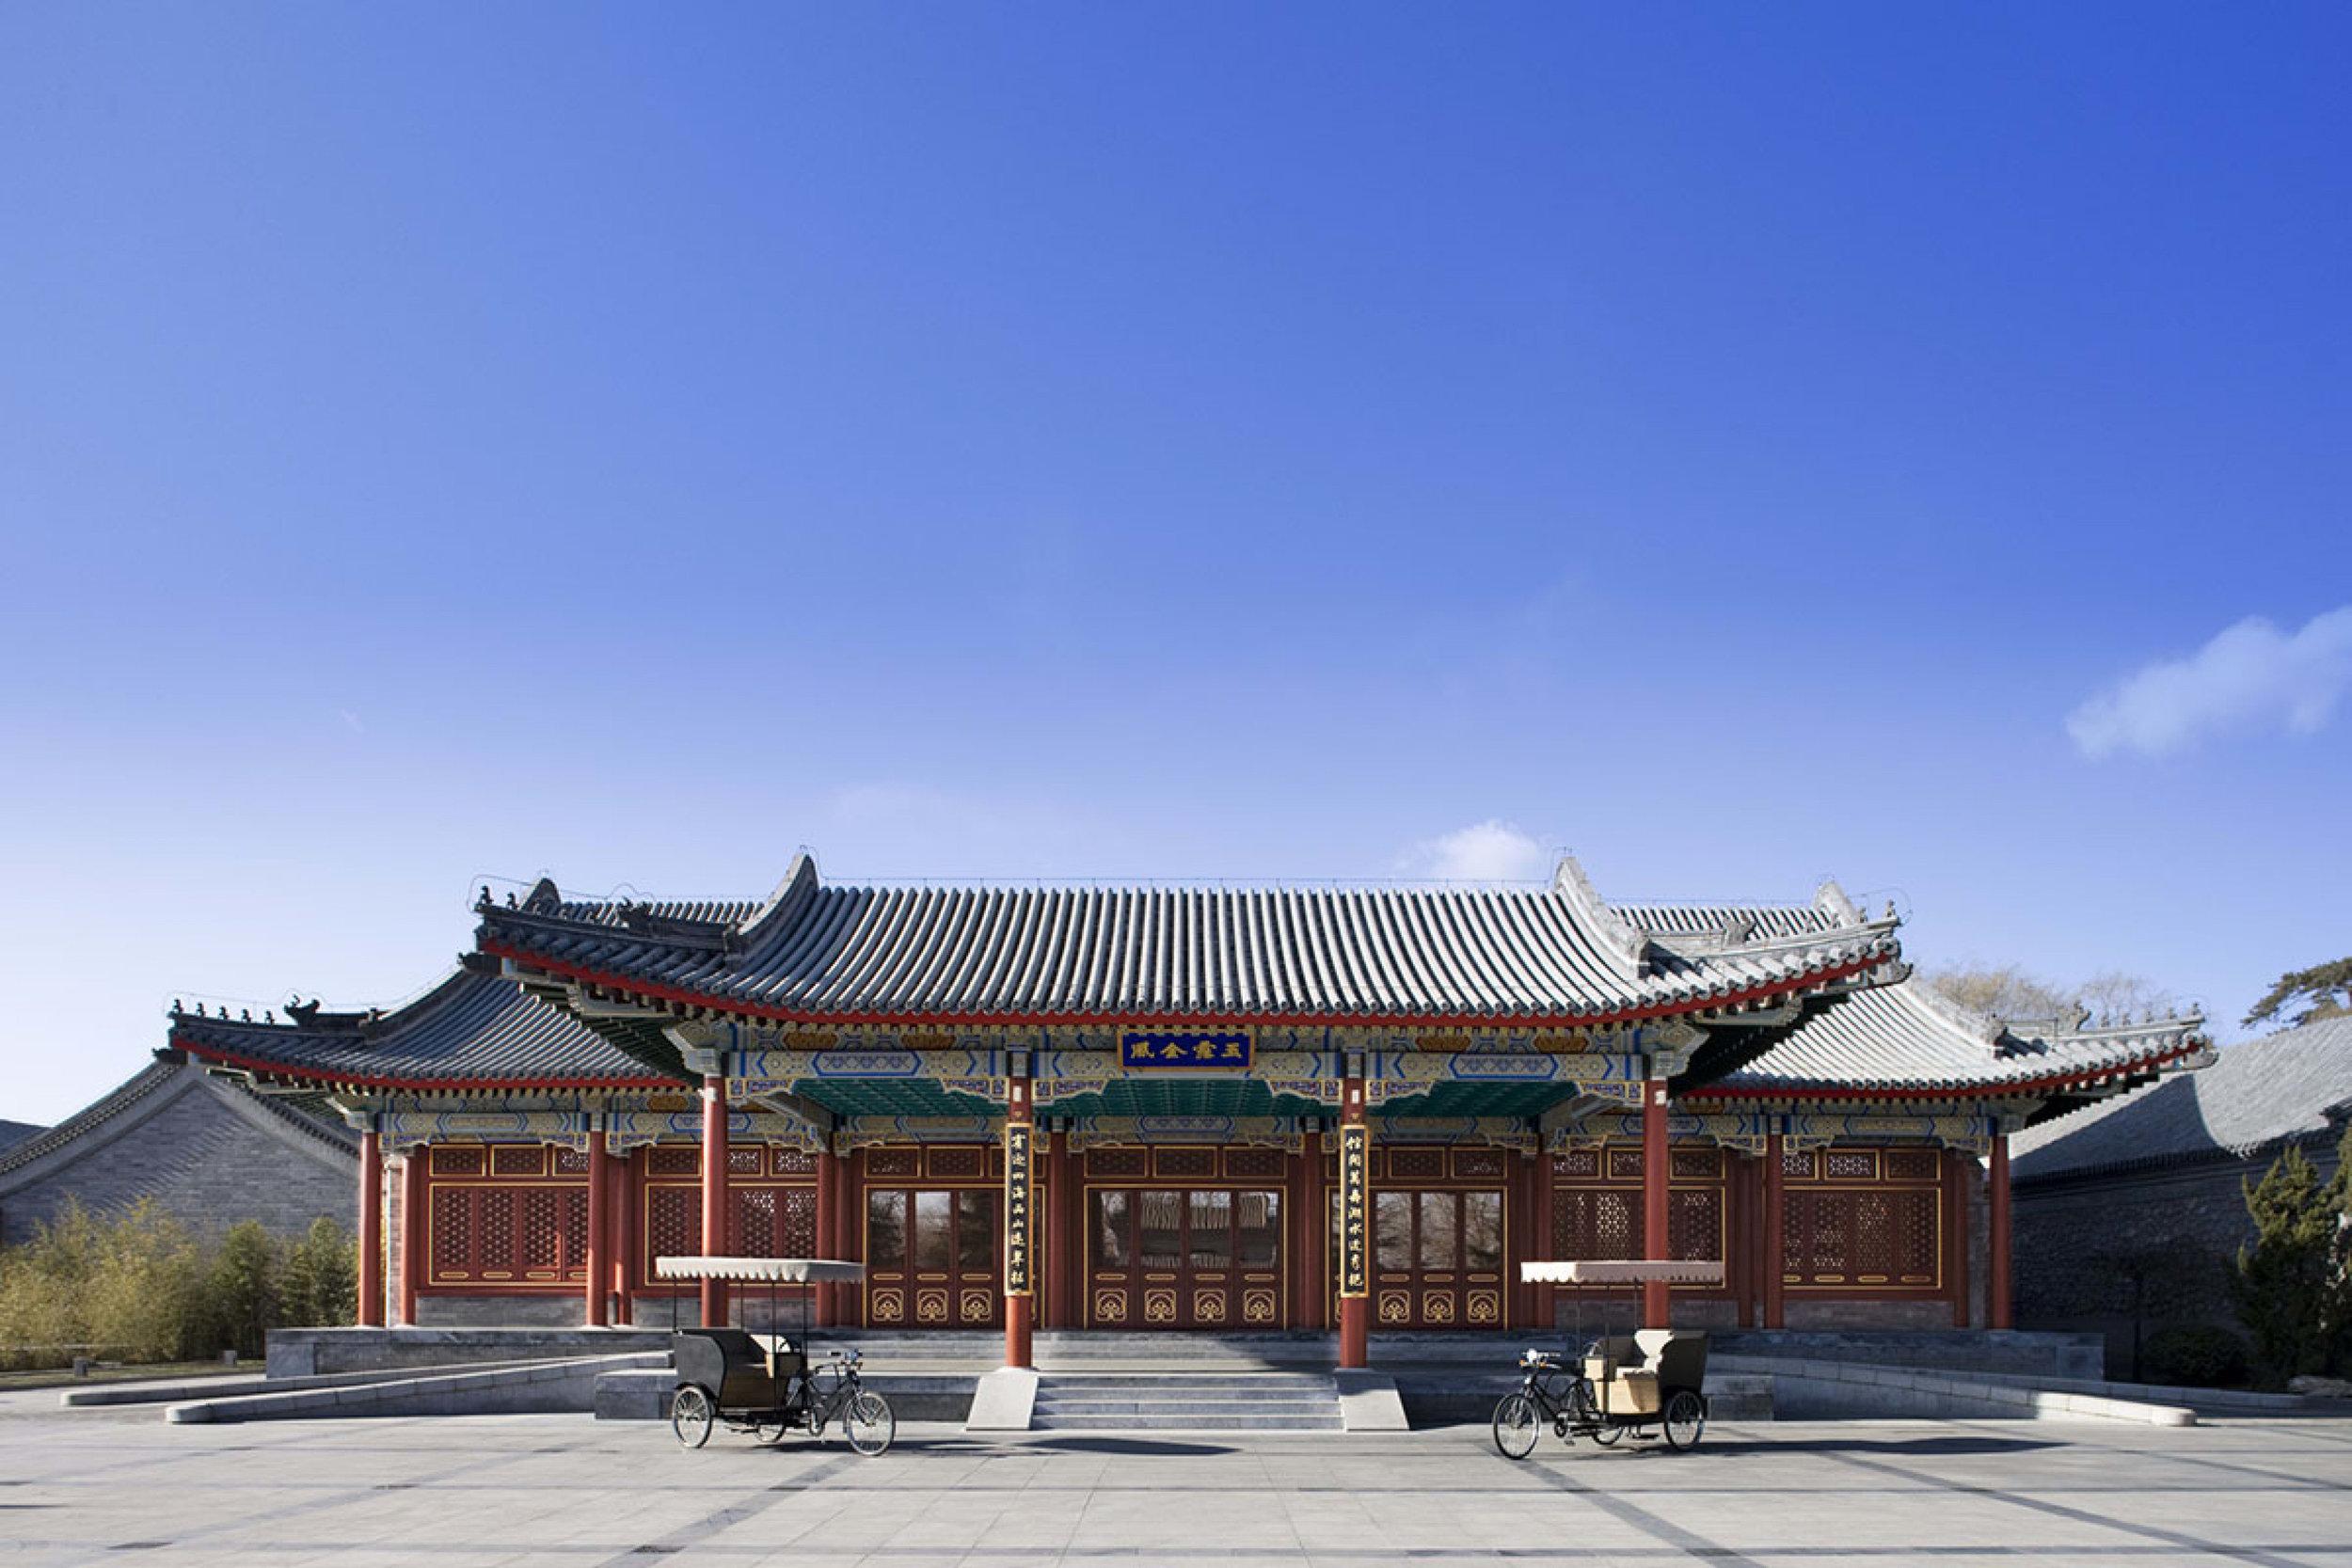 AMAN SUMMER PALACE - Beijing, China